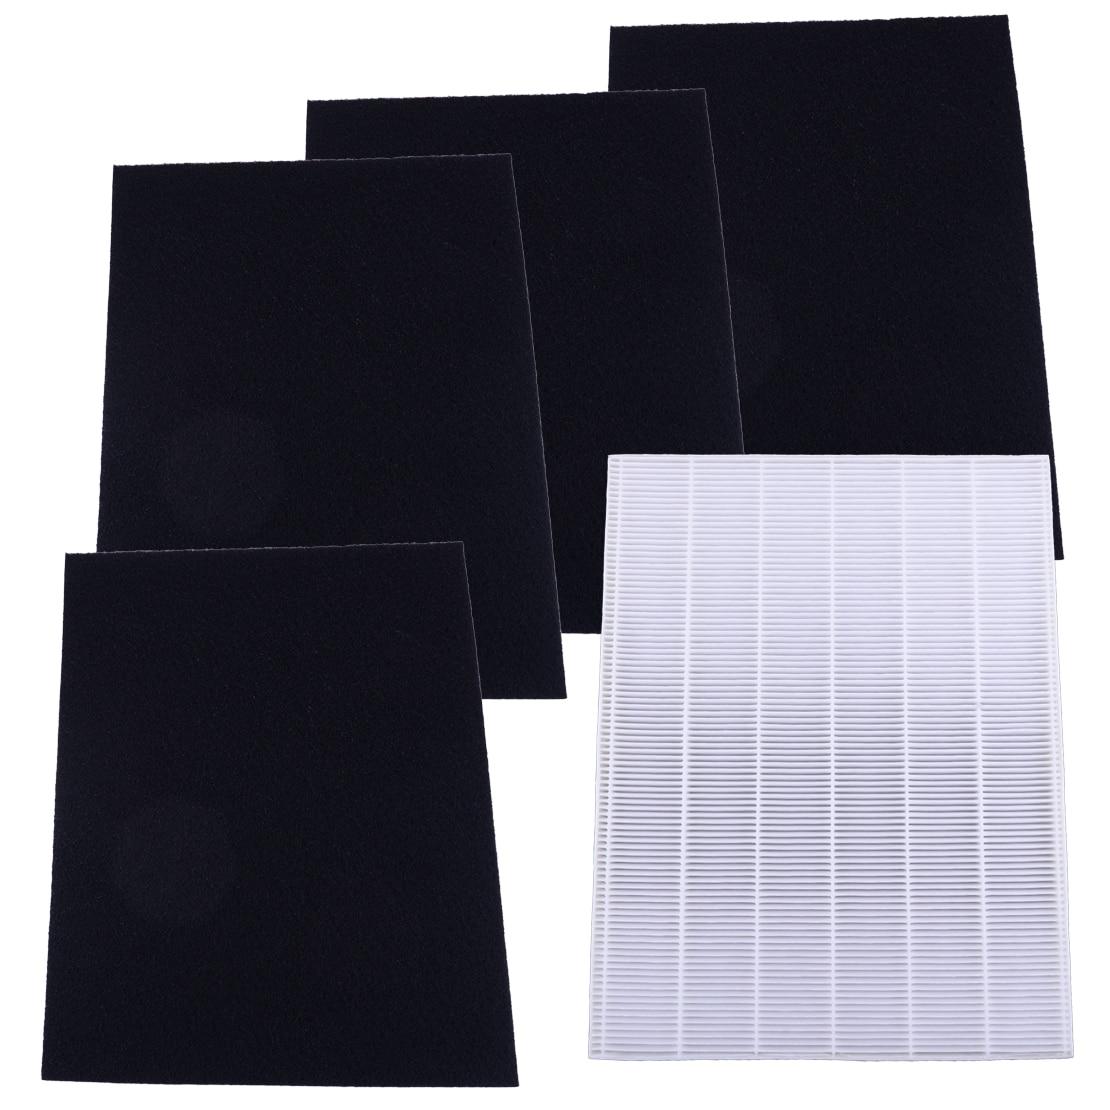 LETAOSK 5pcs HEPA & Carbon Pre Filters Set Fit For Winix 115115 WAC5300 WAC5500 WAC6300 Air Purifier P300 U300 9500 9000 WAC9500LETAOSK 5pcs HEPA & Carbon Pre Filters Set Fit For Winix 115115 WAC5300 WAC5500 WAC6300 Air Purifier P300 U300 9500 9000 WAC9500